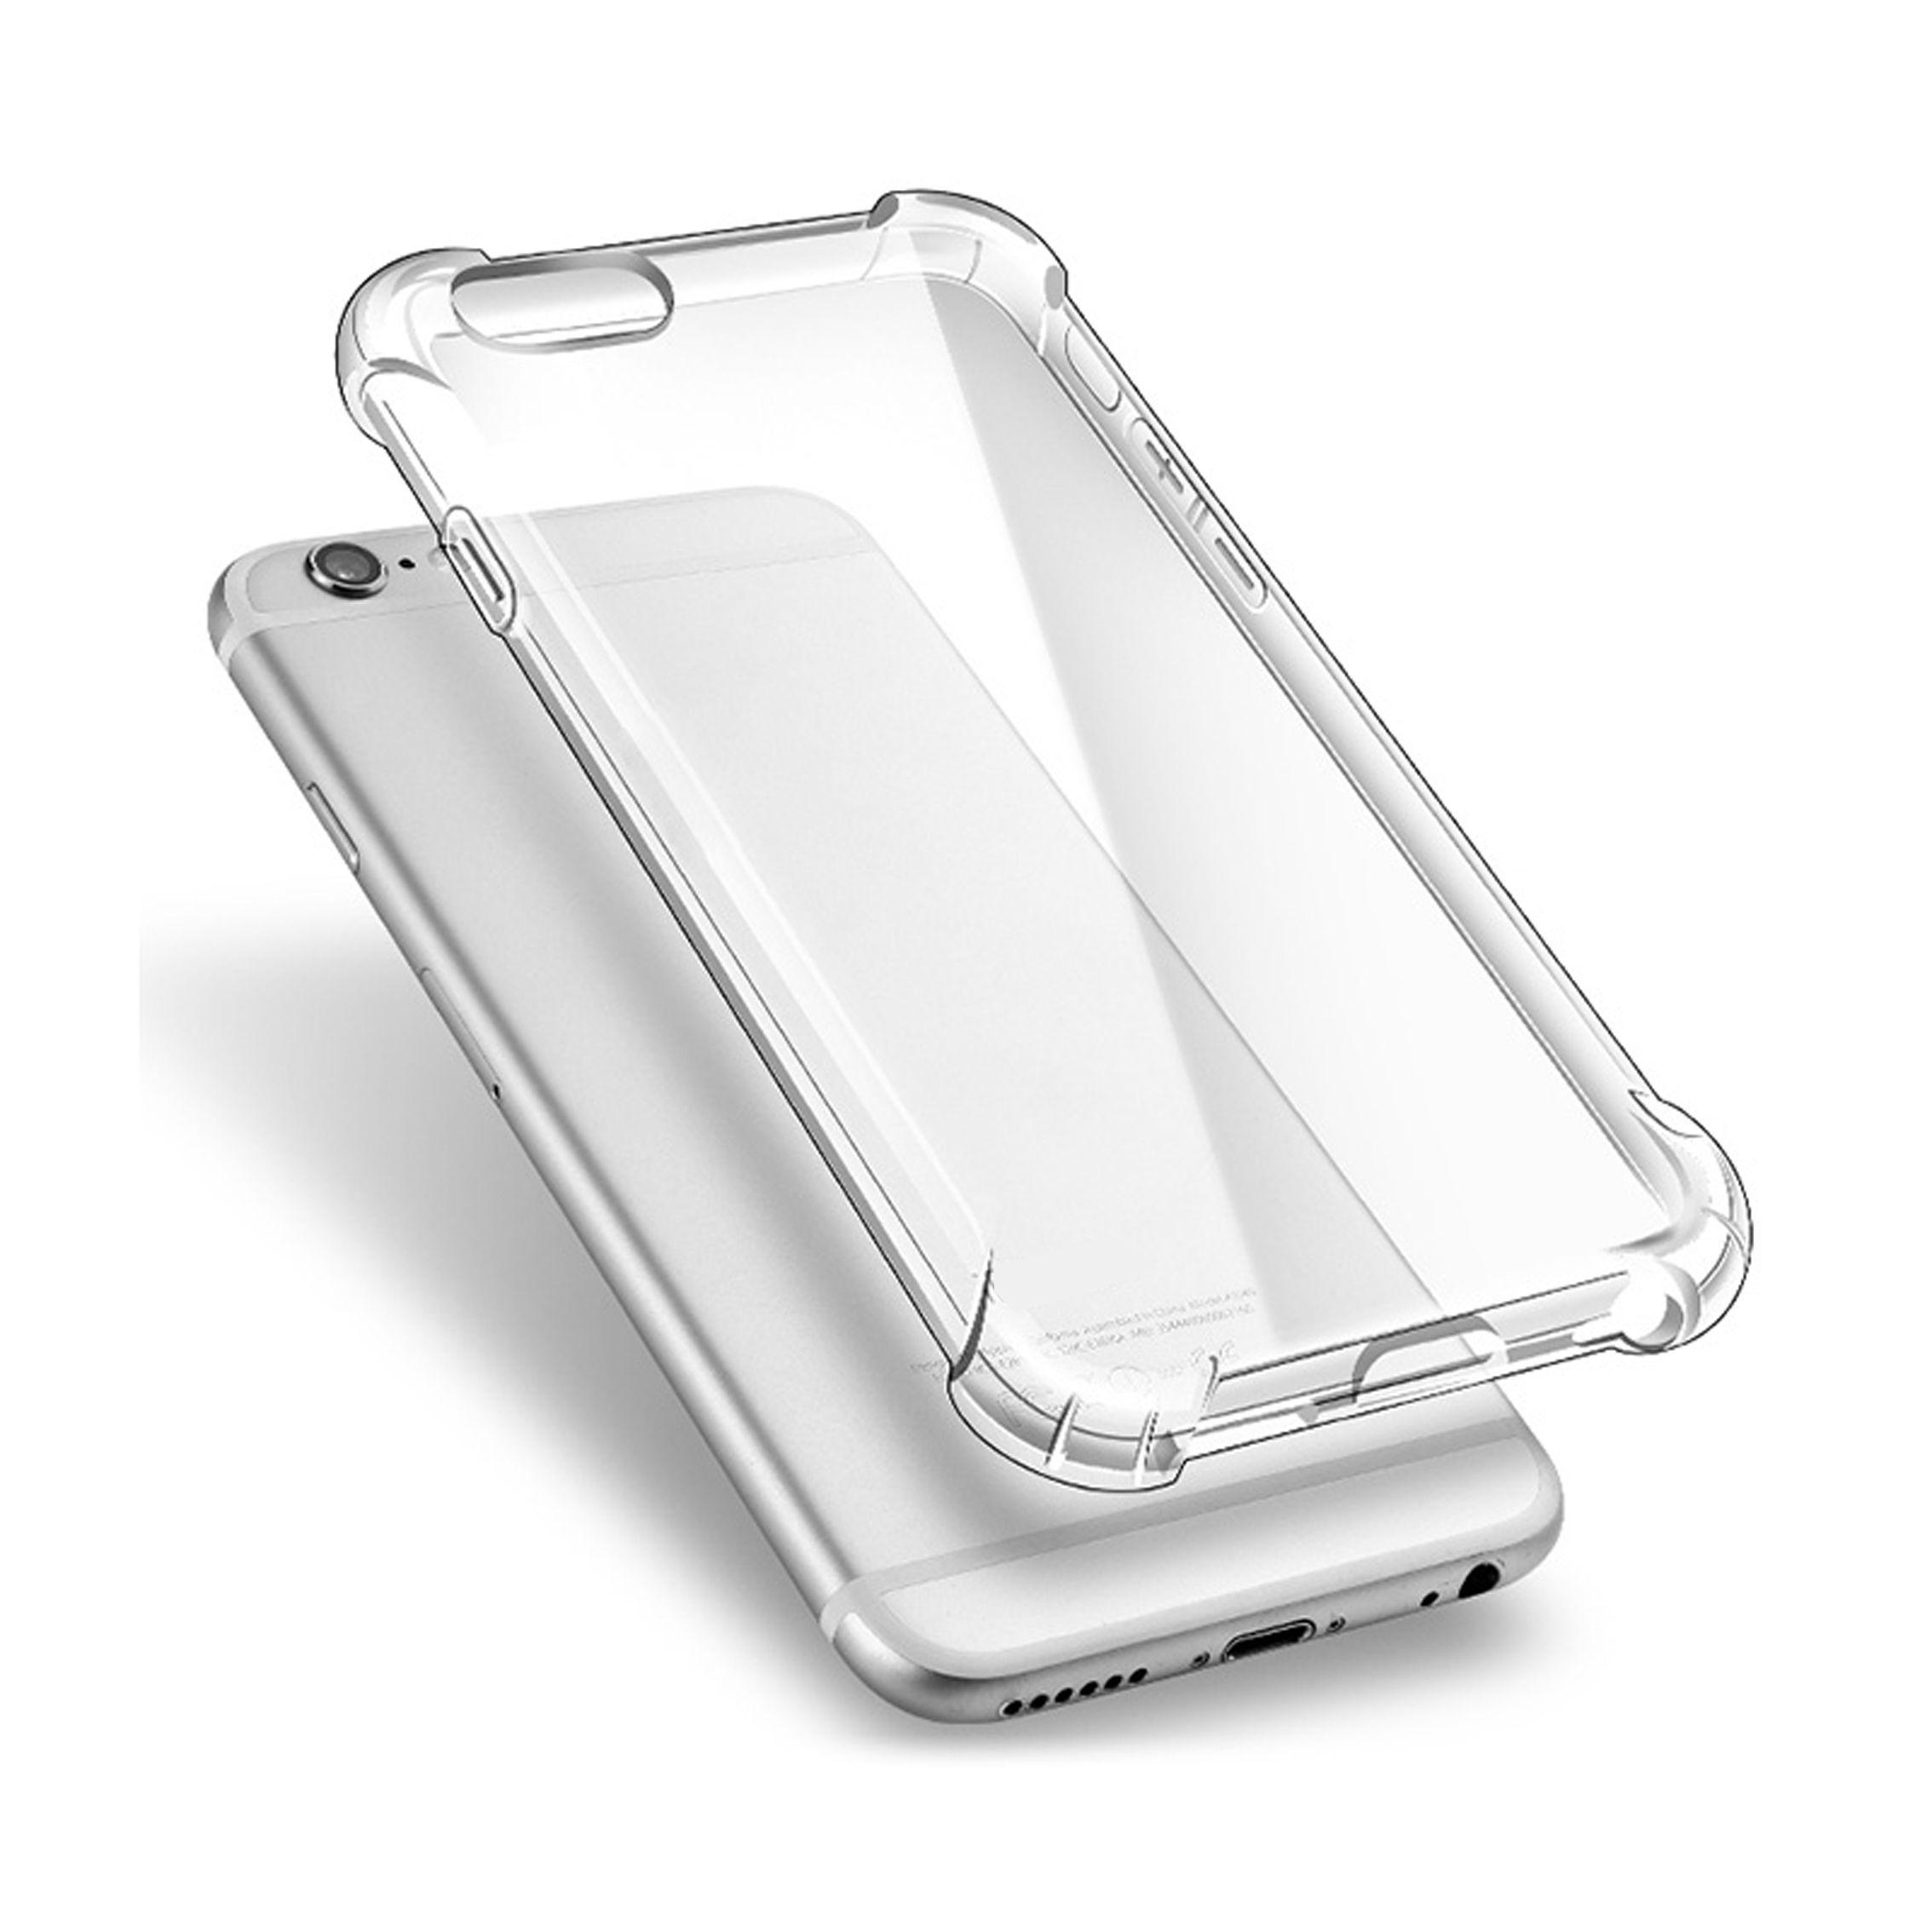 100% authentic 40fef 692cc Shockproof Transparent Soft For IPHONE 6/6S/6 PLUS/7/7 PLUS TPU Case 360  Degree Full Cover Anti Break Transparent Protective Cover Protector ...